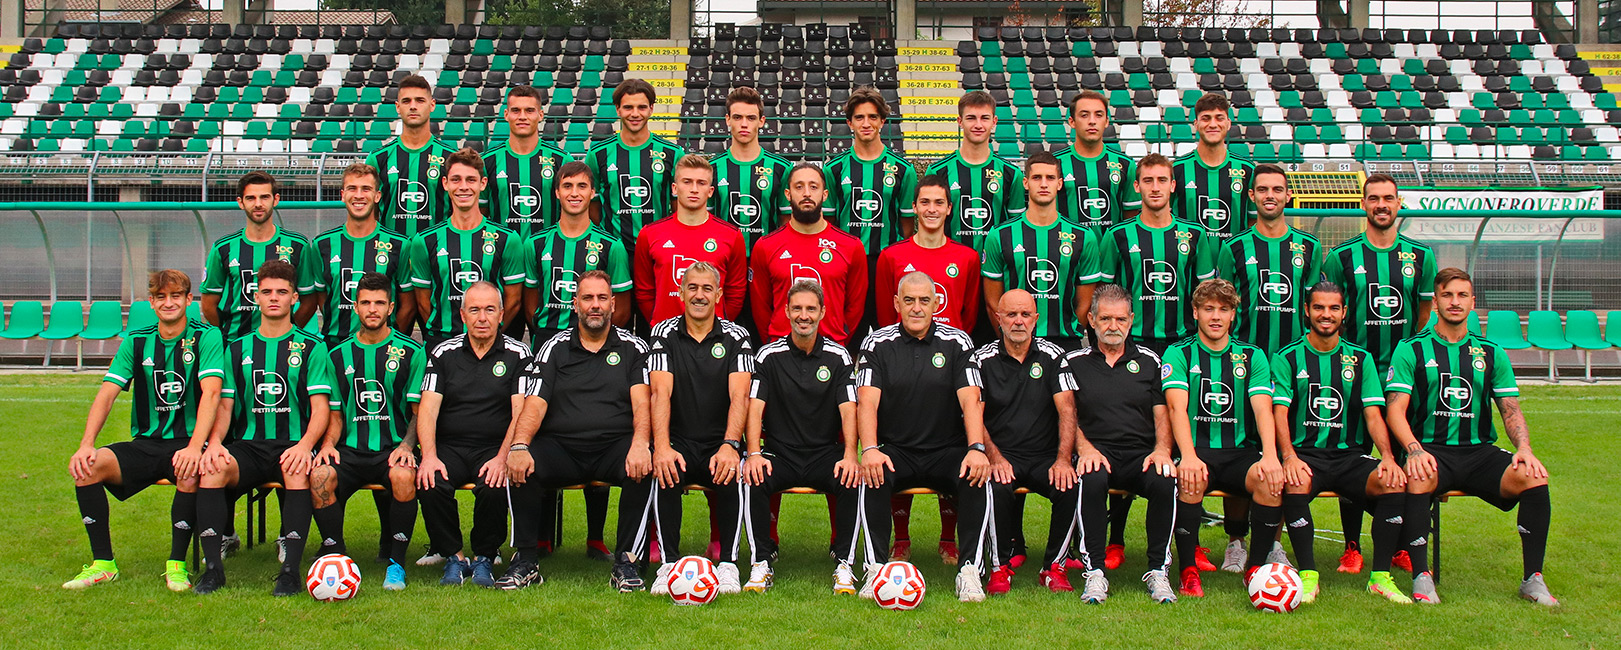 11Rosa Castellanzese Calcio 1921 2021-2022 serie D gir. B